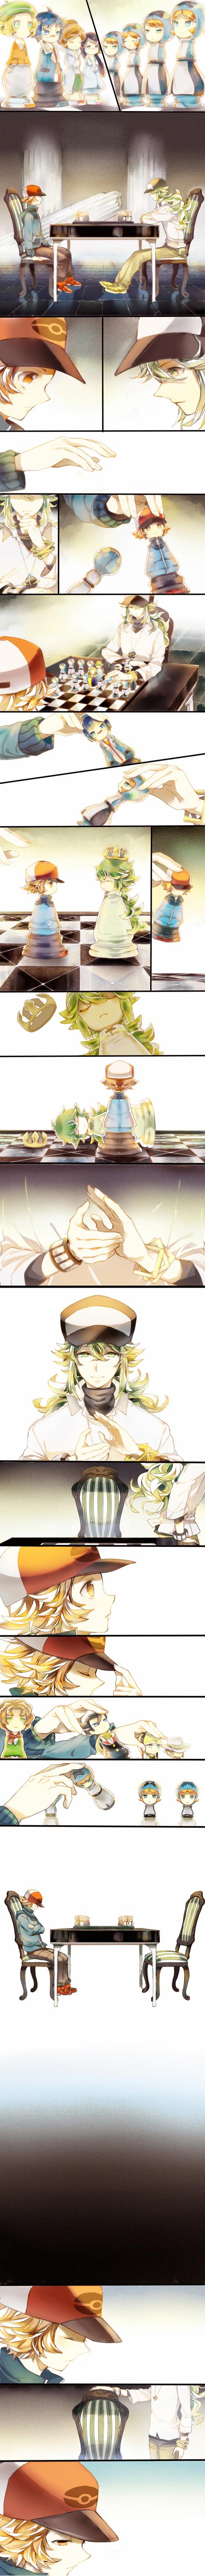 Tags: Anime, Yuuichi-87, Pokémon, Bel (Pokémon), Kamitsure, Cheren (Pokémon), Giima, N (Pokémon), Plasma-dan Shitappa (Male), Arty (Pokémon), Araragi (Pokémon), Plasma-dan Shitappa (Female), Makomo (Pokémon)